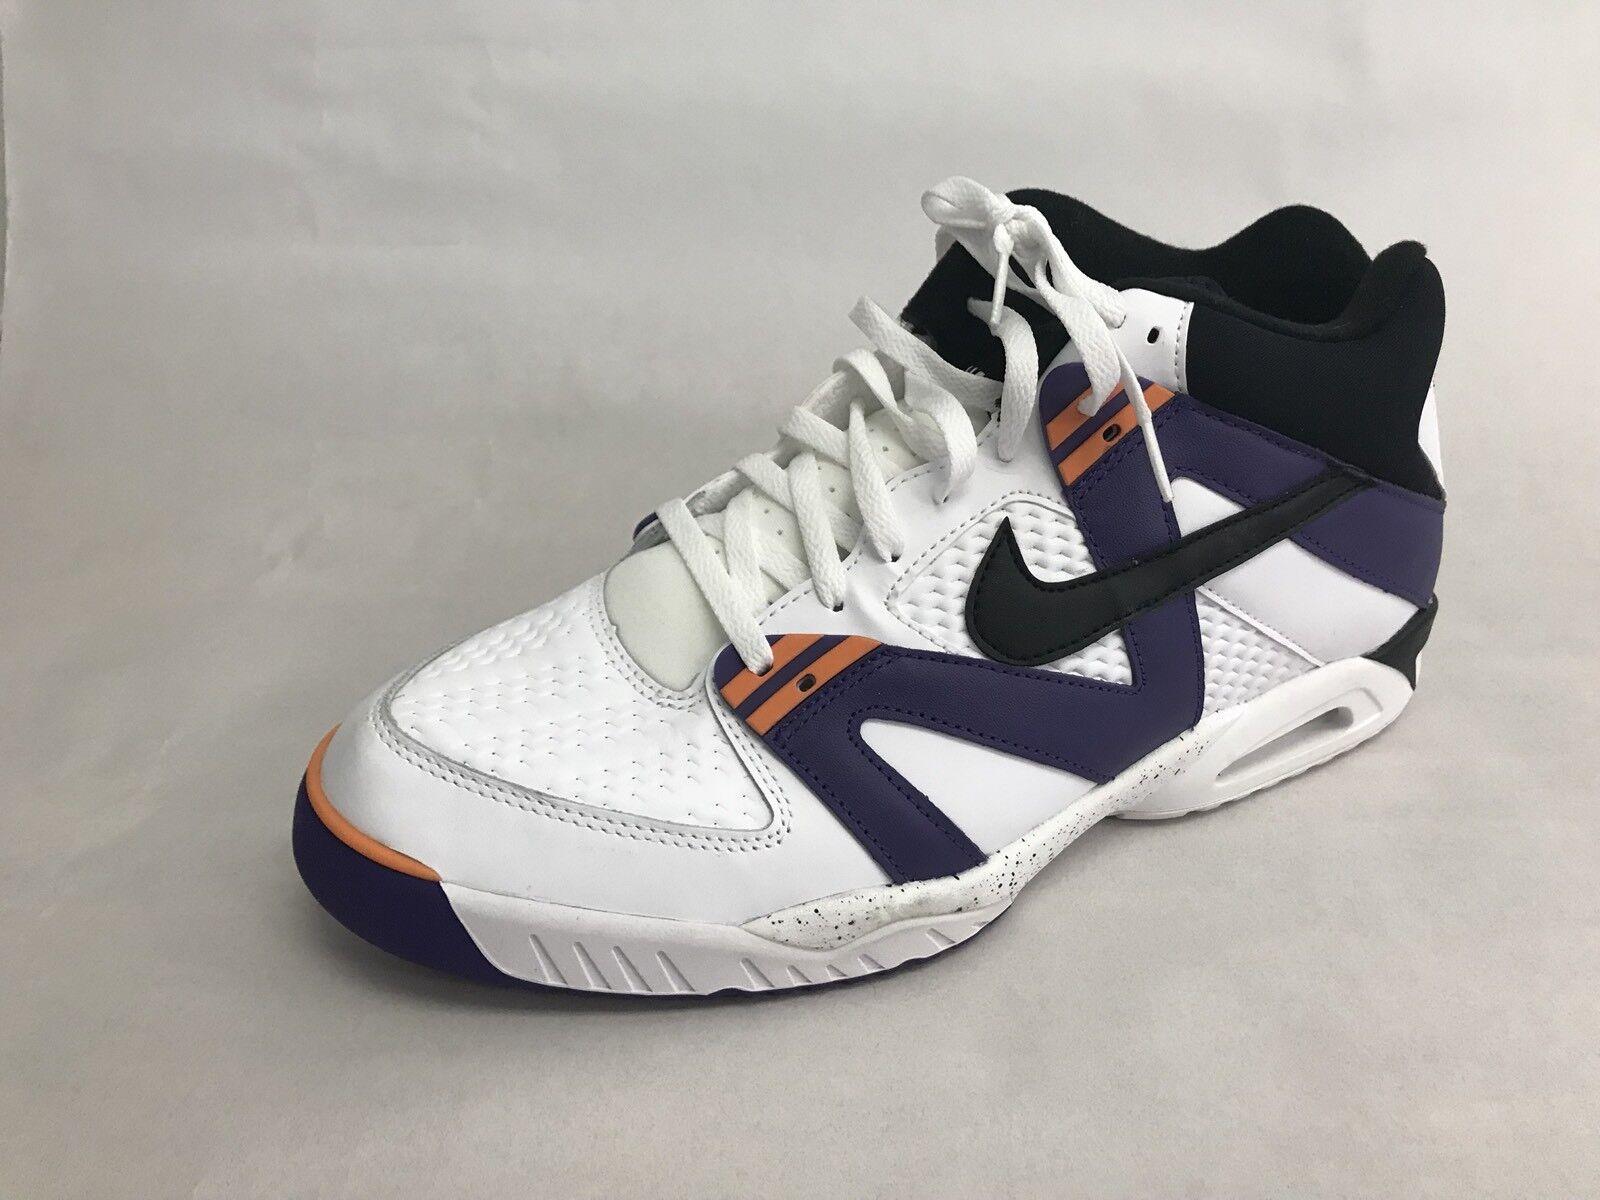 Nike Air Tech Challenge 3s Purple - Agassi French Open Purple 3s Orange - Men's 15 e54a1b